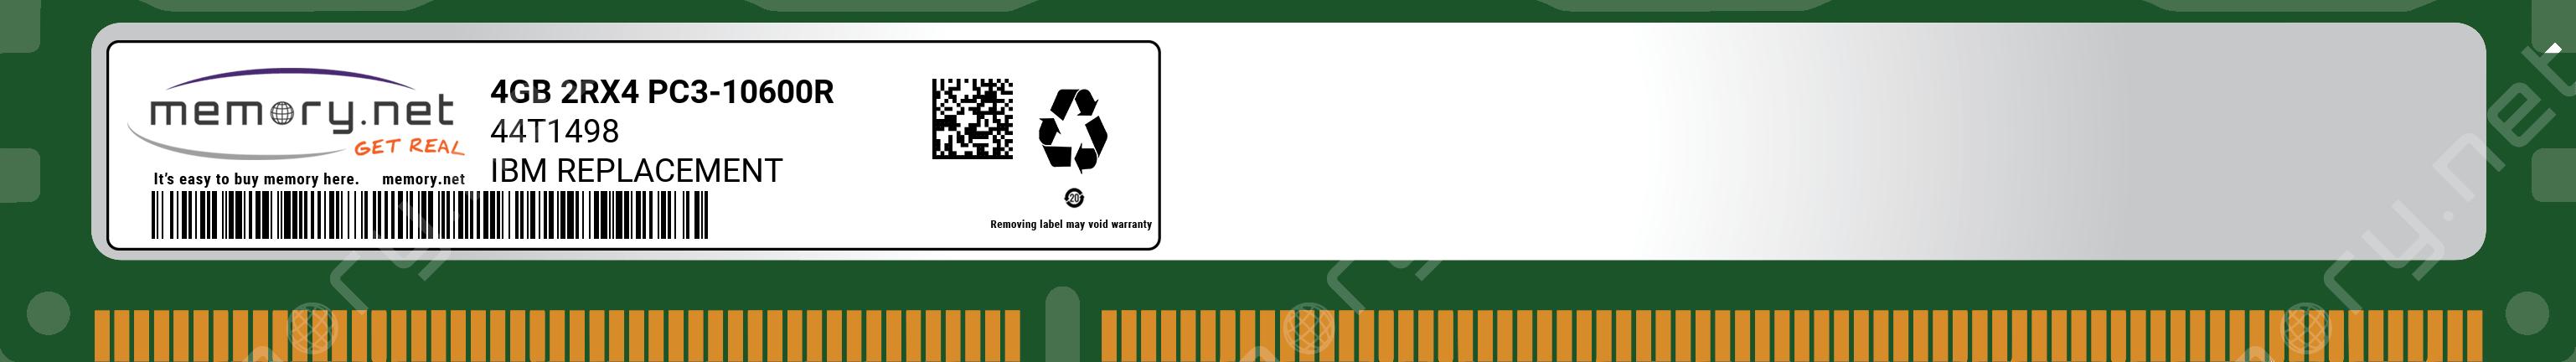 44T1498